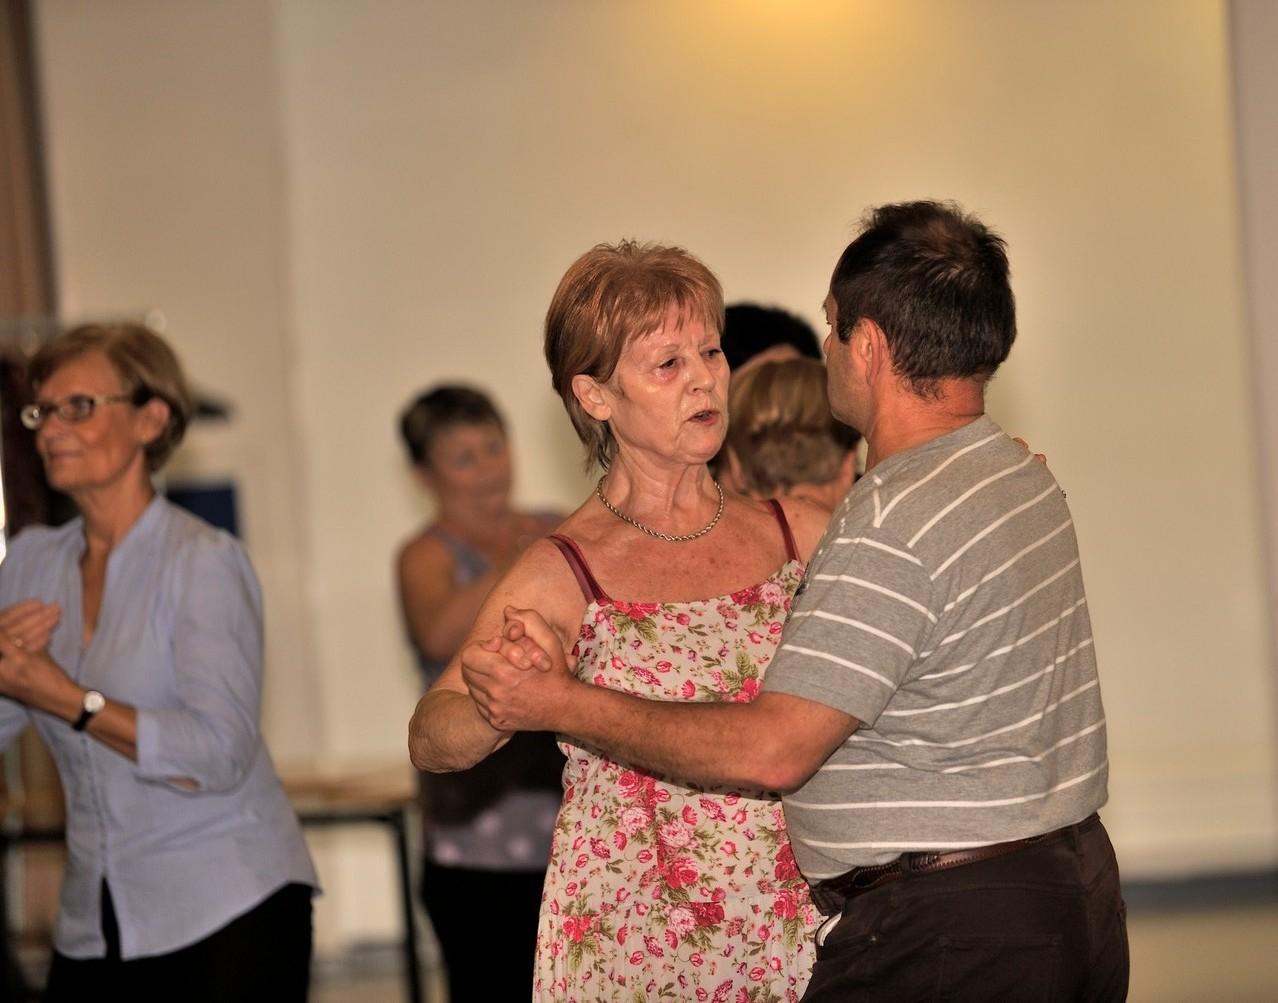 Tango (danse de salon)